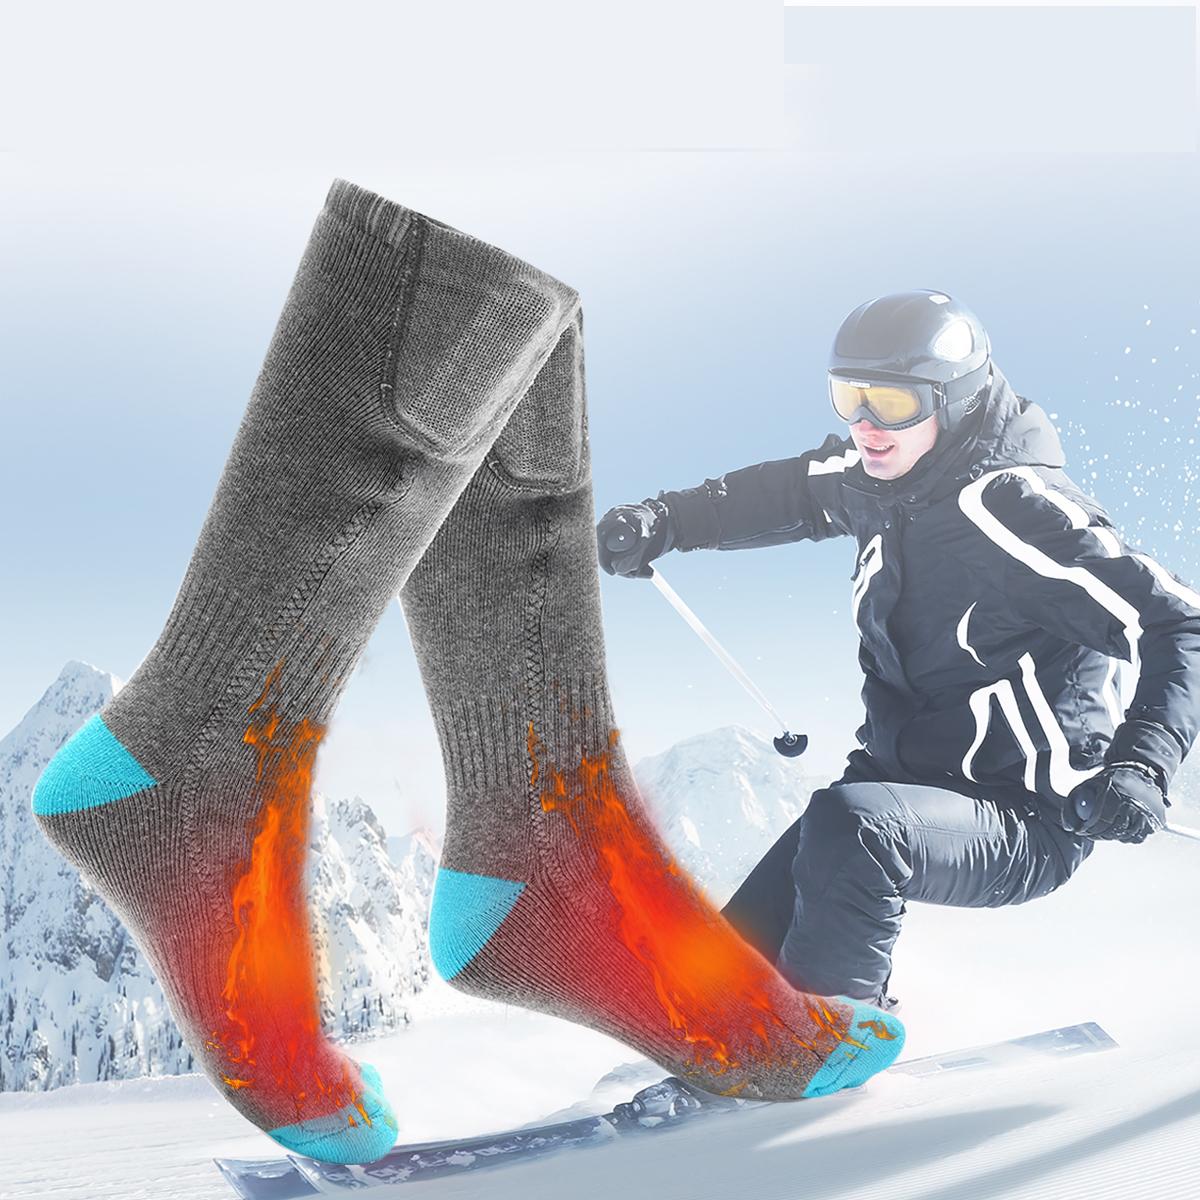 Outdoor Sports Bike Skiing Socks Rechargeable Battery